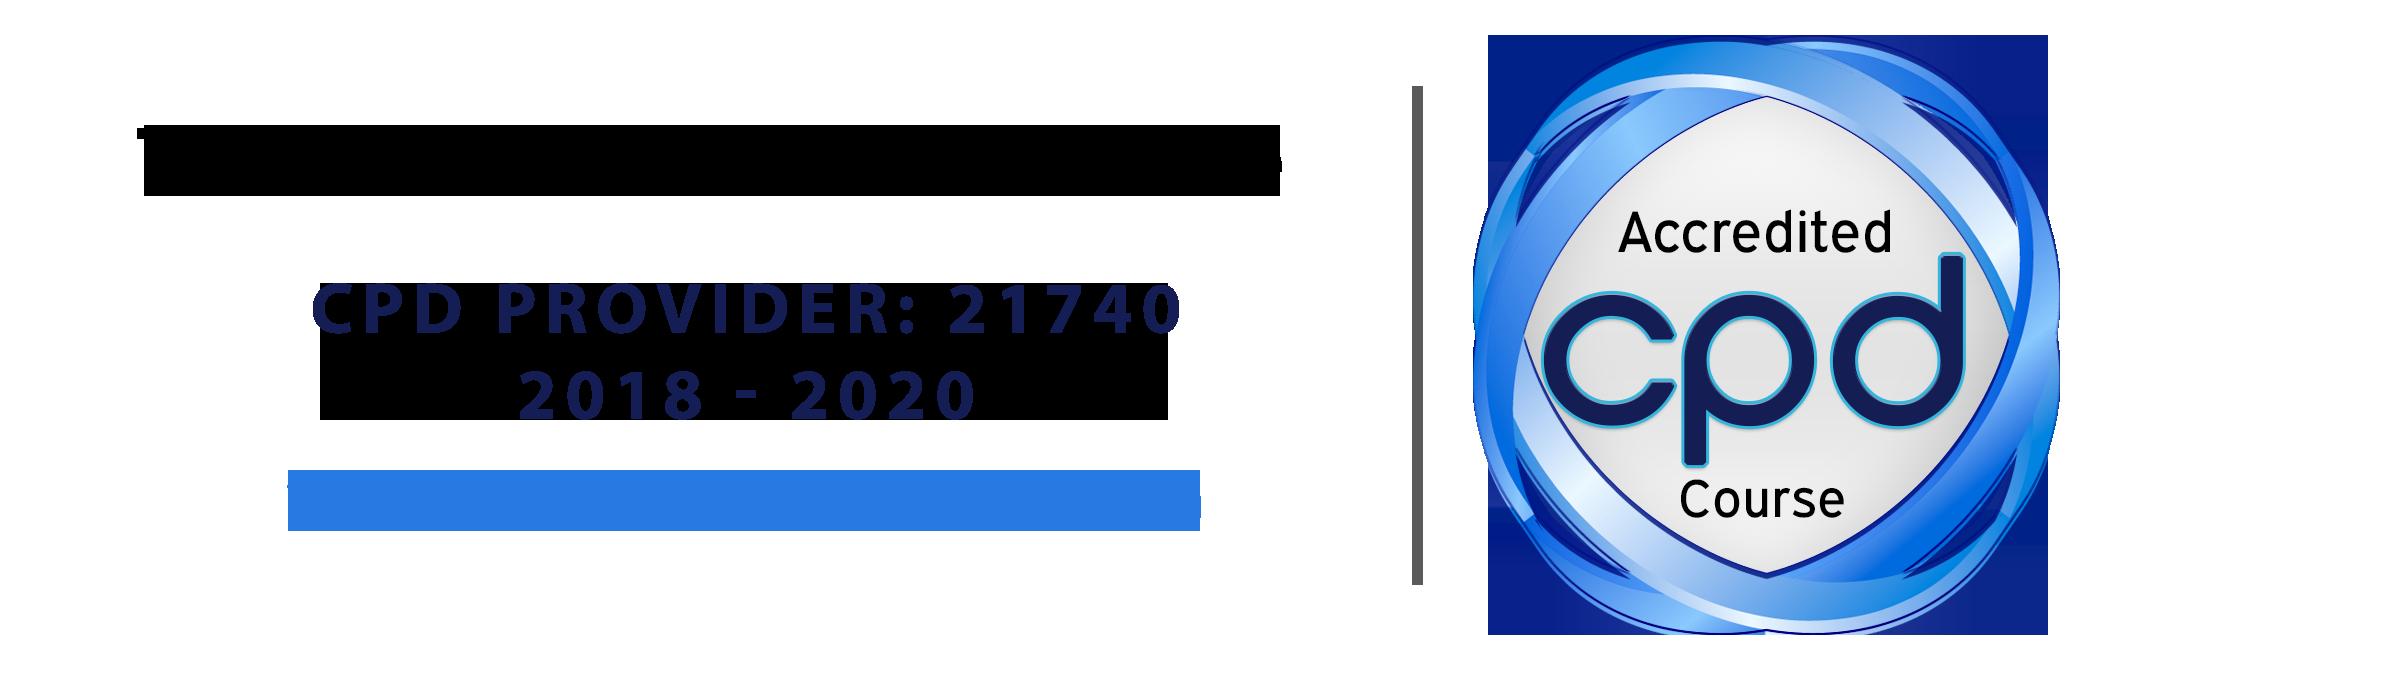 CPD-Accreditation-Global-Health-Professionals-Ltd